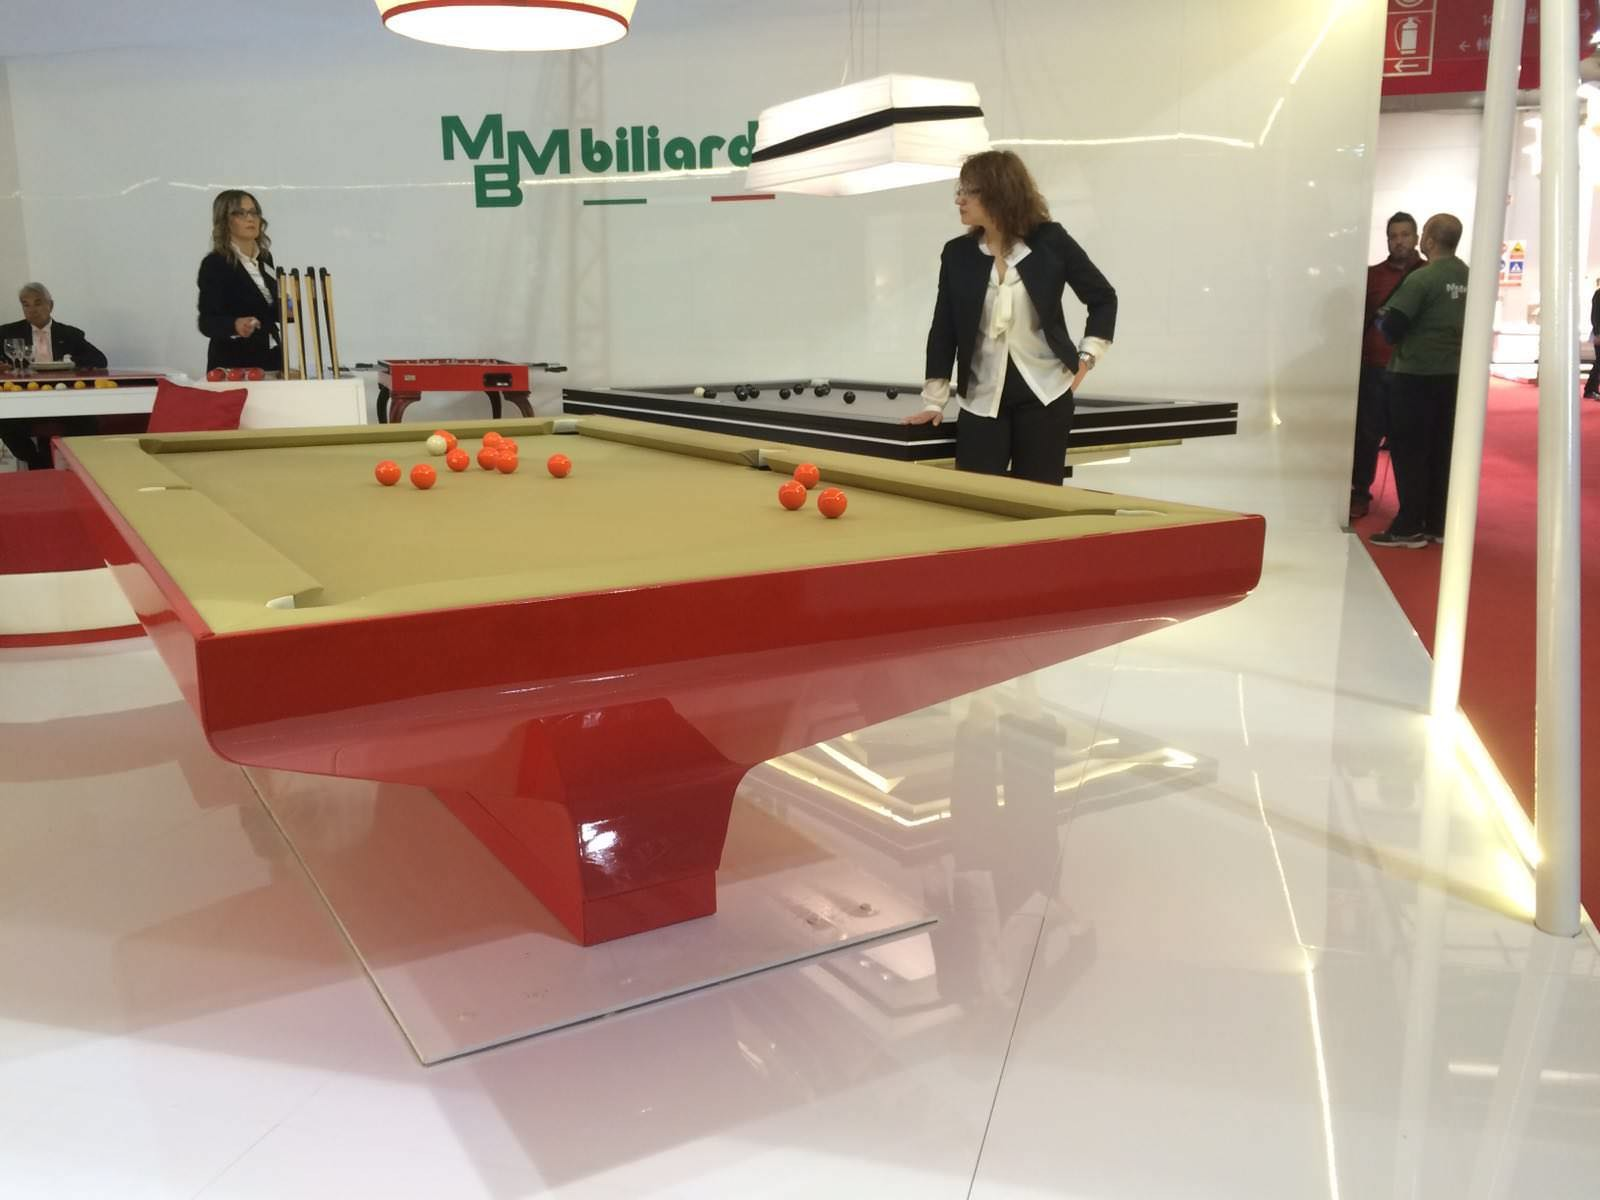 Salone_Internazionalei_Milano_2016_isaloni_MBM_Biliardi4